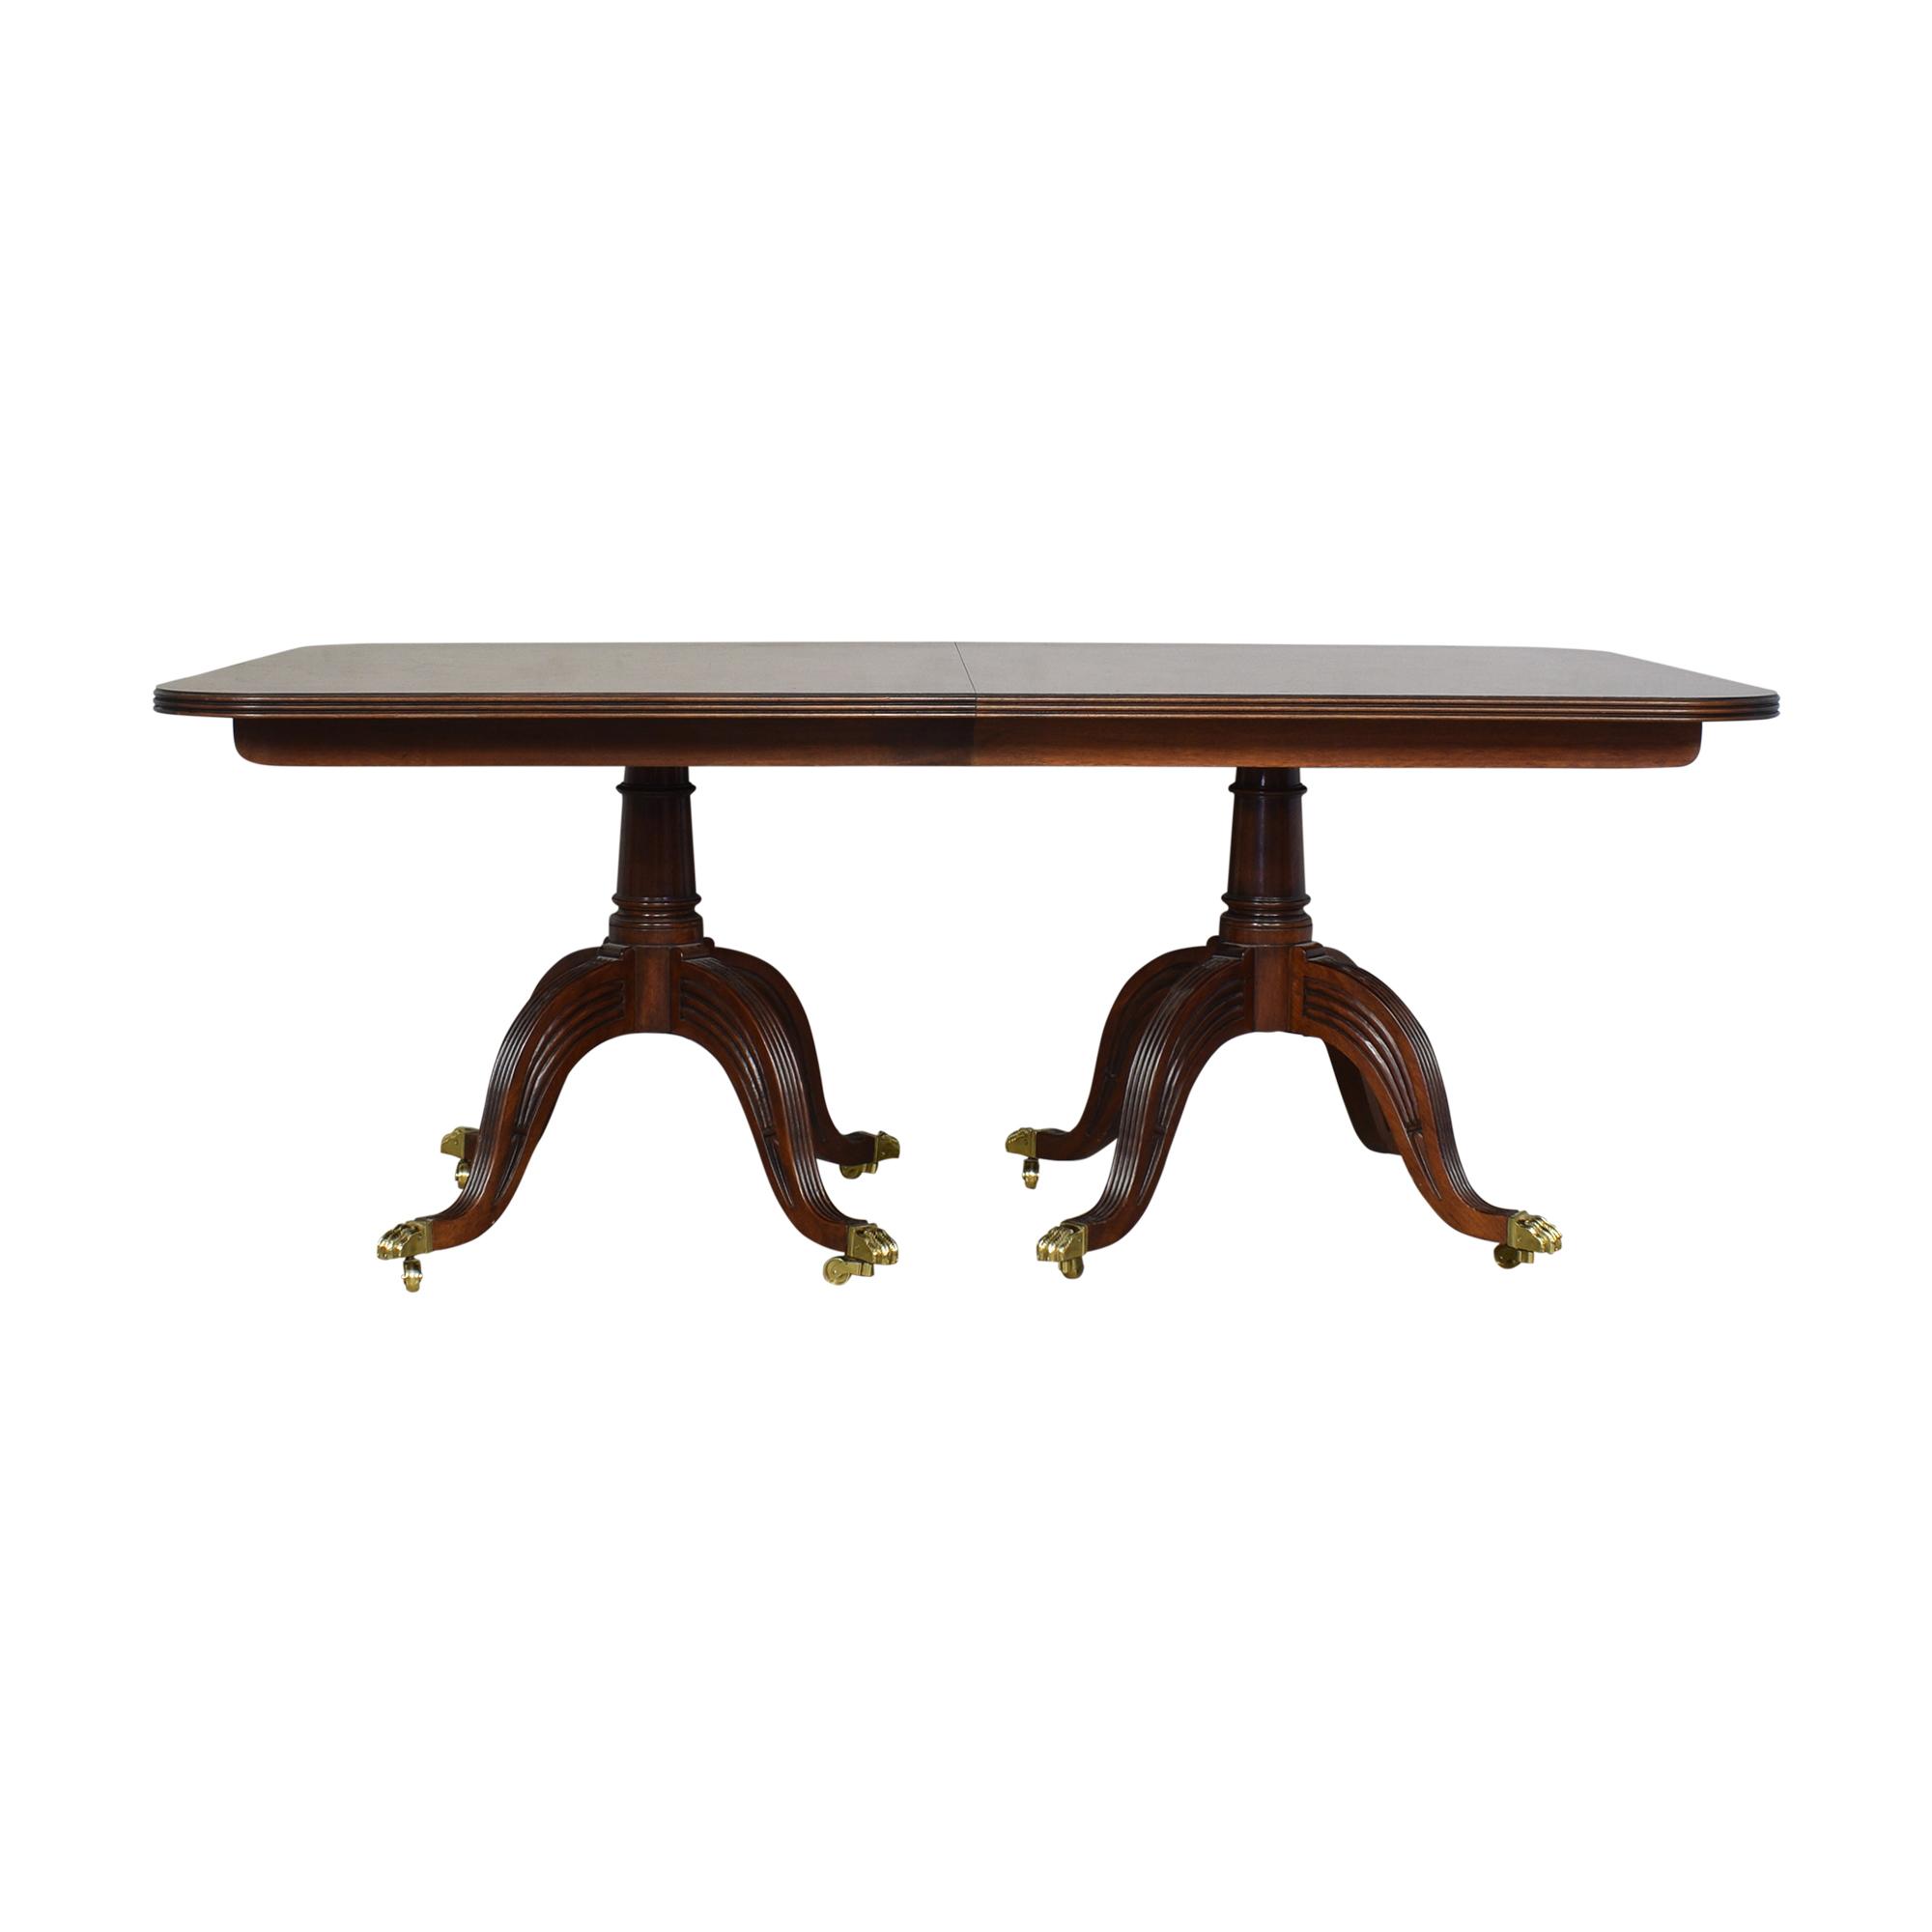 Henredon Furniture Henredon Double Pedestal Extendable Dining Table ct